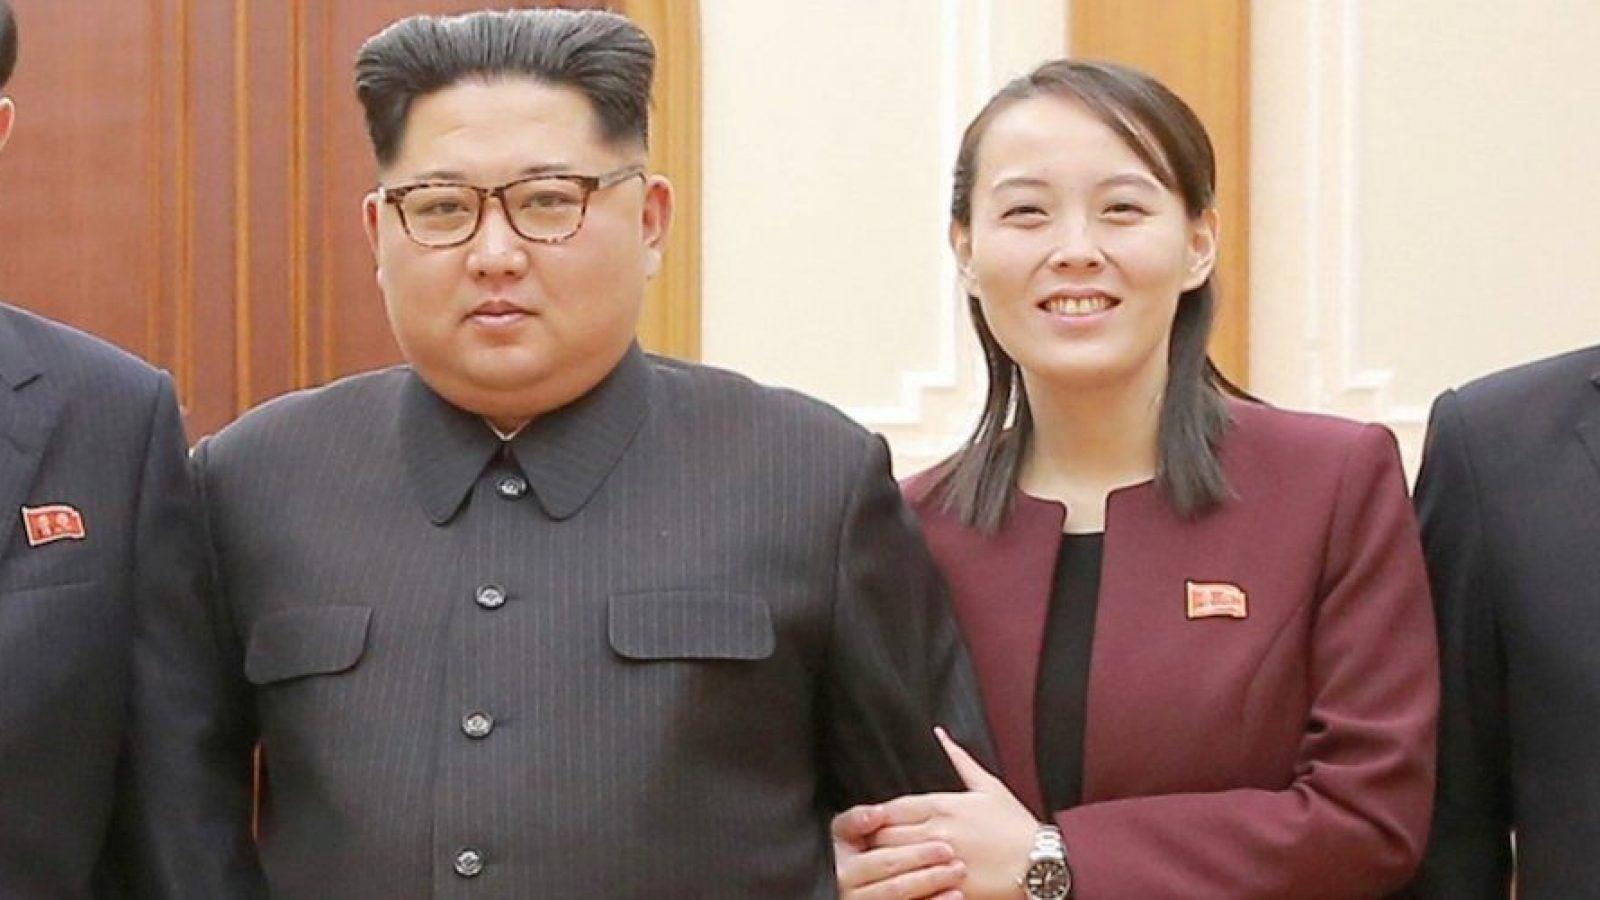 Kim Yo Jong holds Kim Jong Un's arm as they pose for a photo